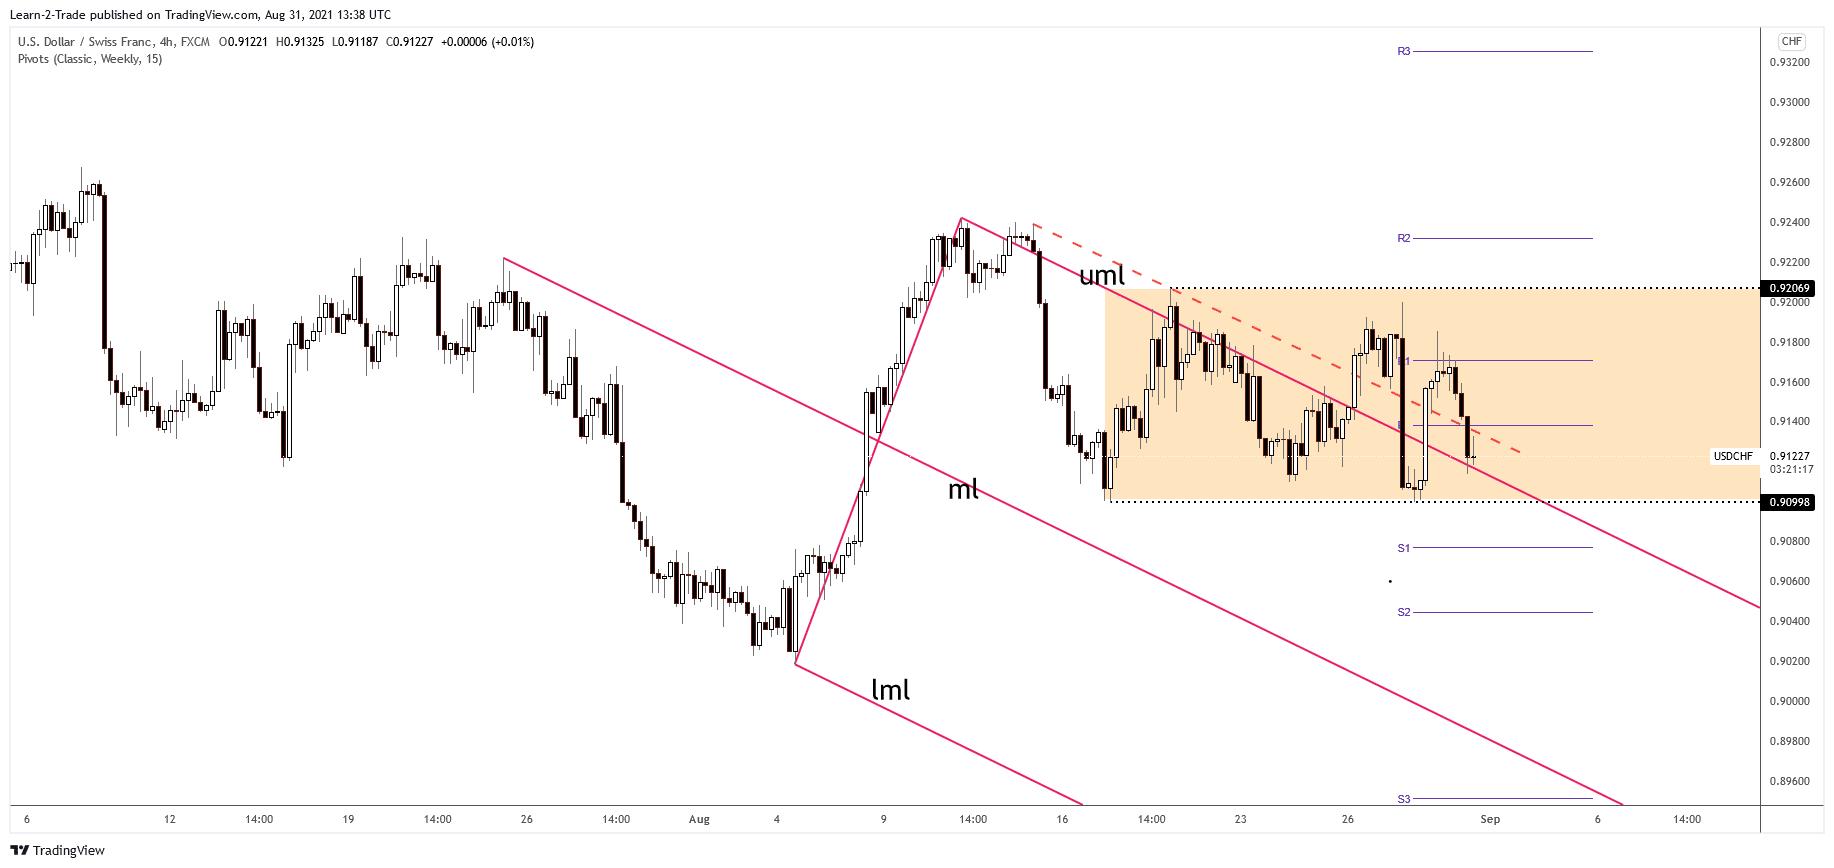 USD/CHF 4-hour price chart